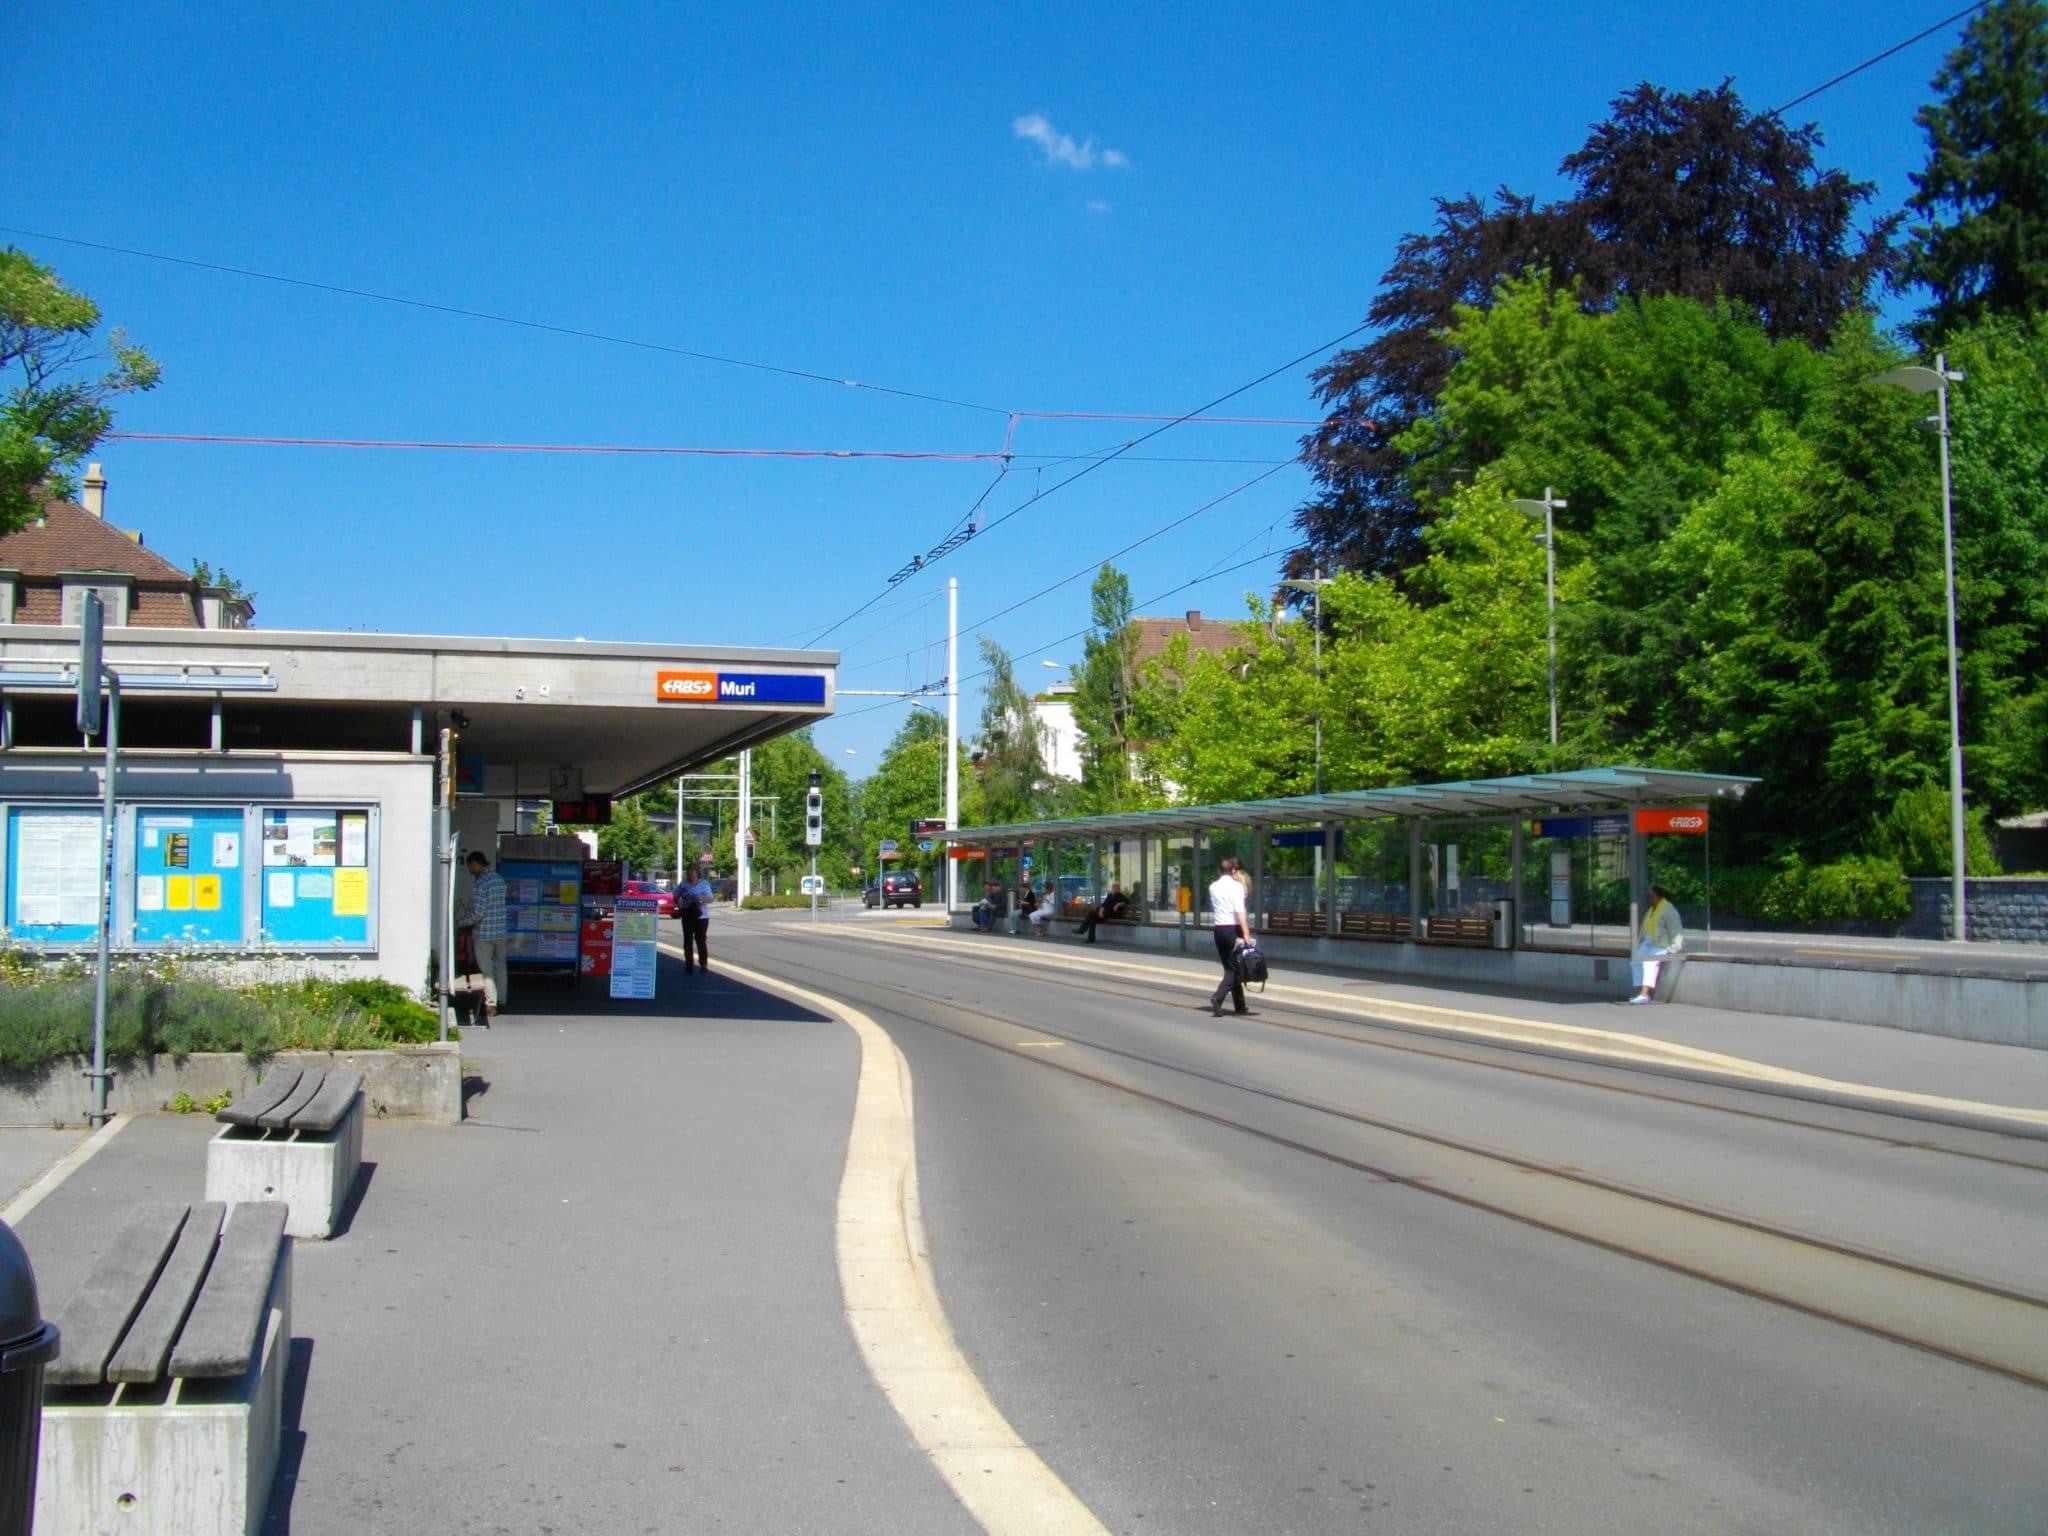 Muri bei Bern